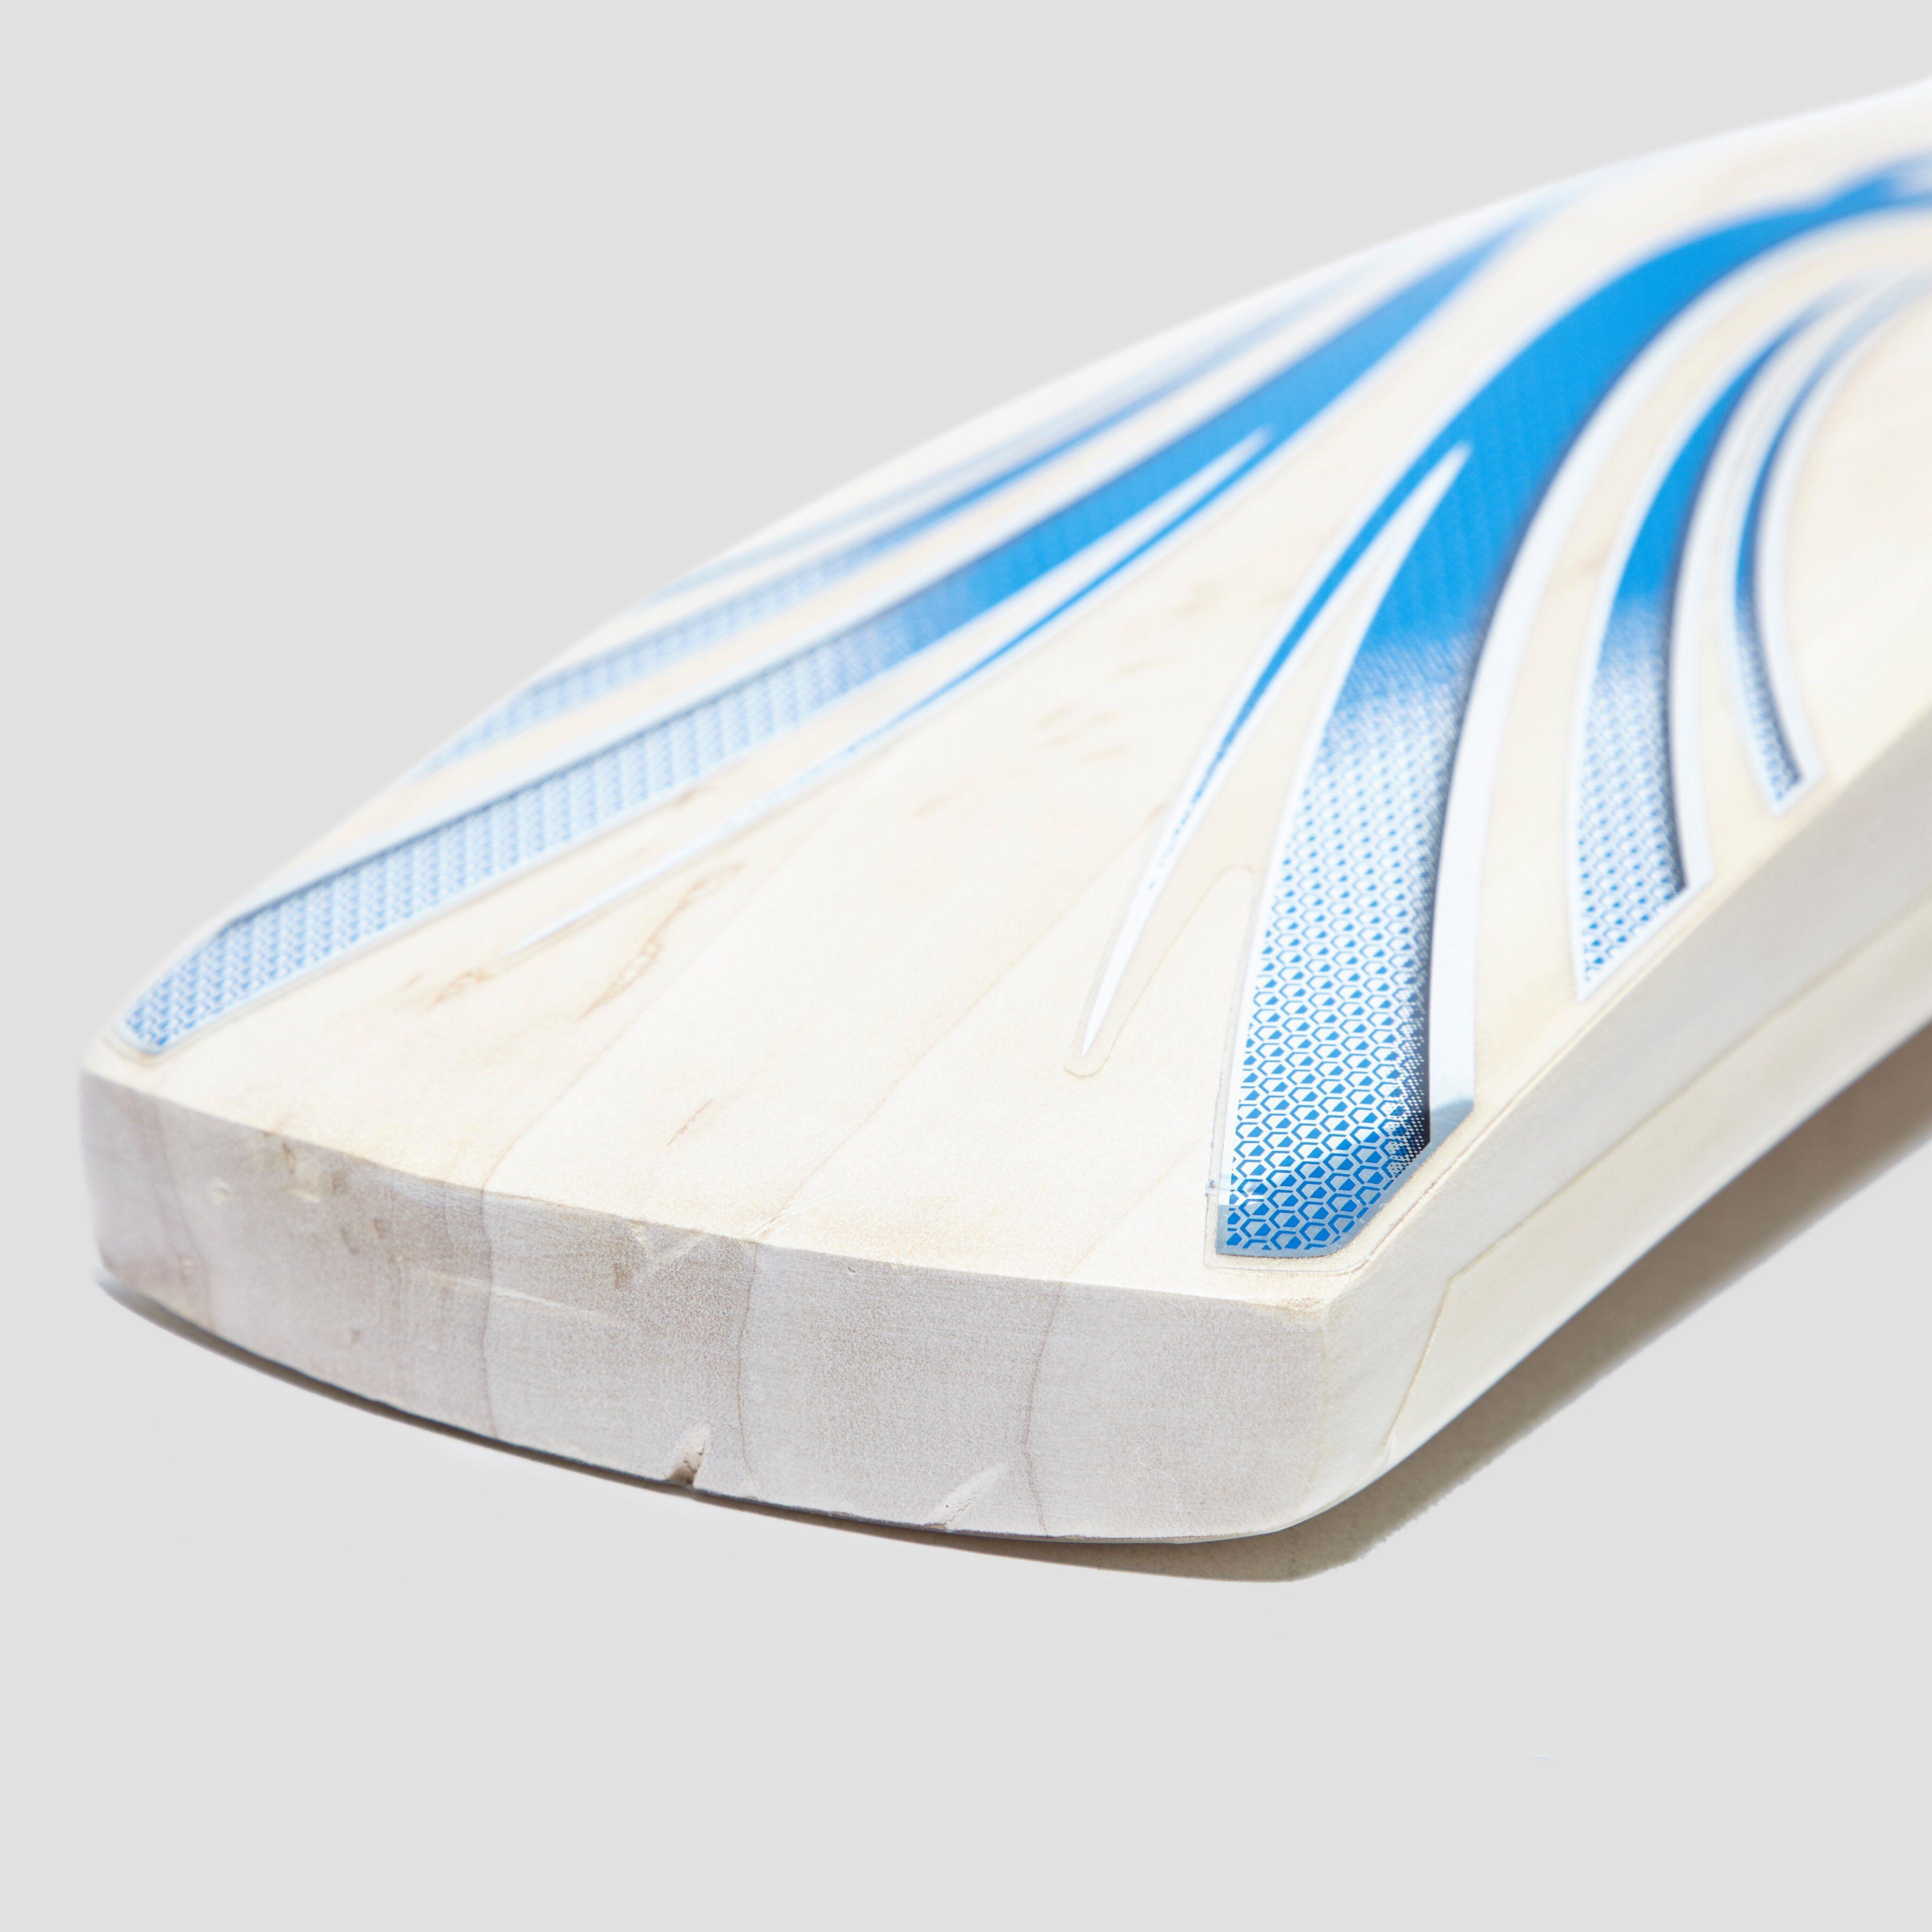 Gray-Nicolls Powerbow 6 700 Lite Cricket Bat